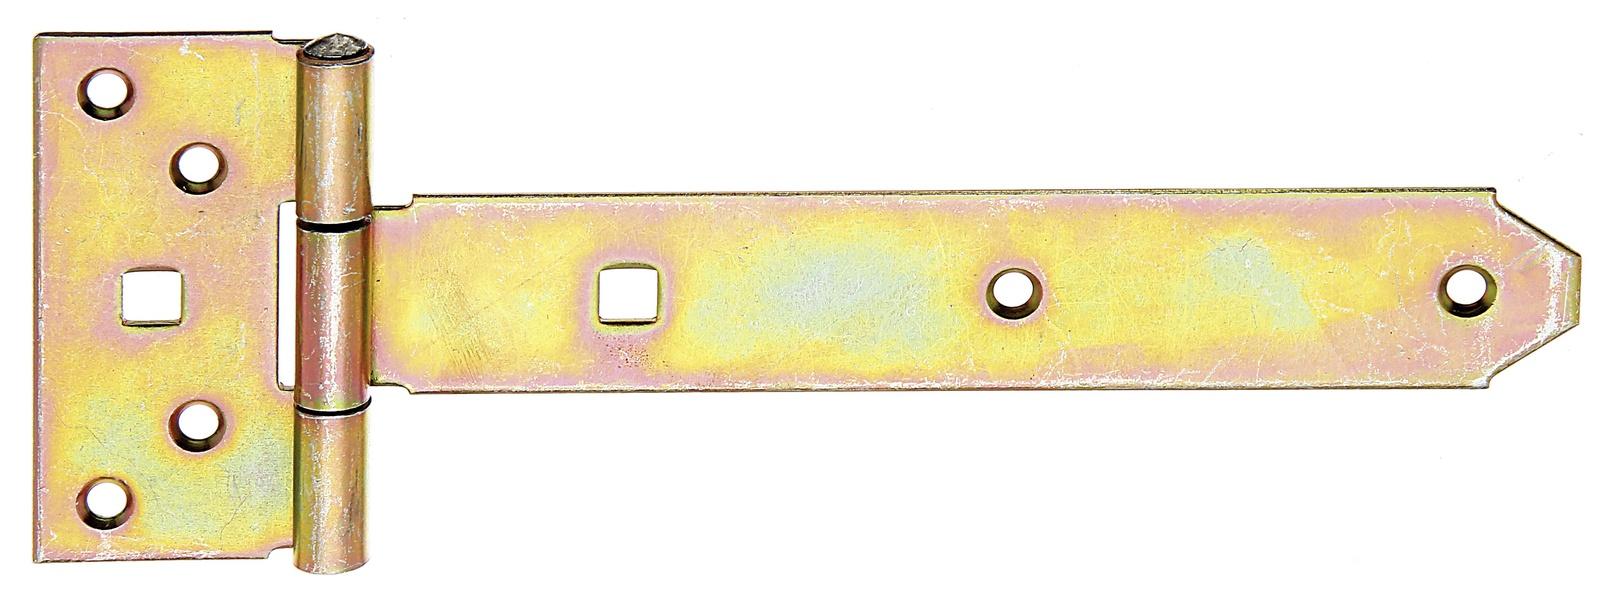 Петля для ворот,Gah Alberts, Т-образная оцинкованная 195 х 34 мм петля дверная gah alberts 310714